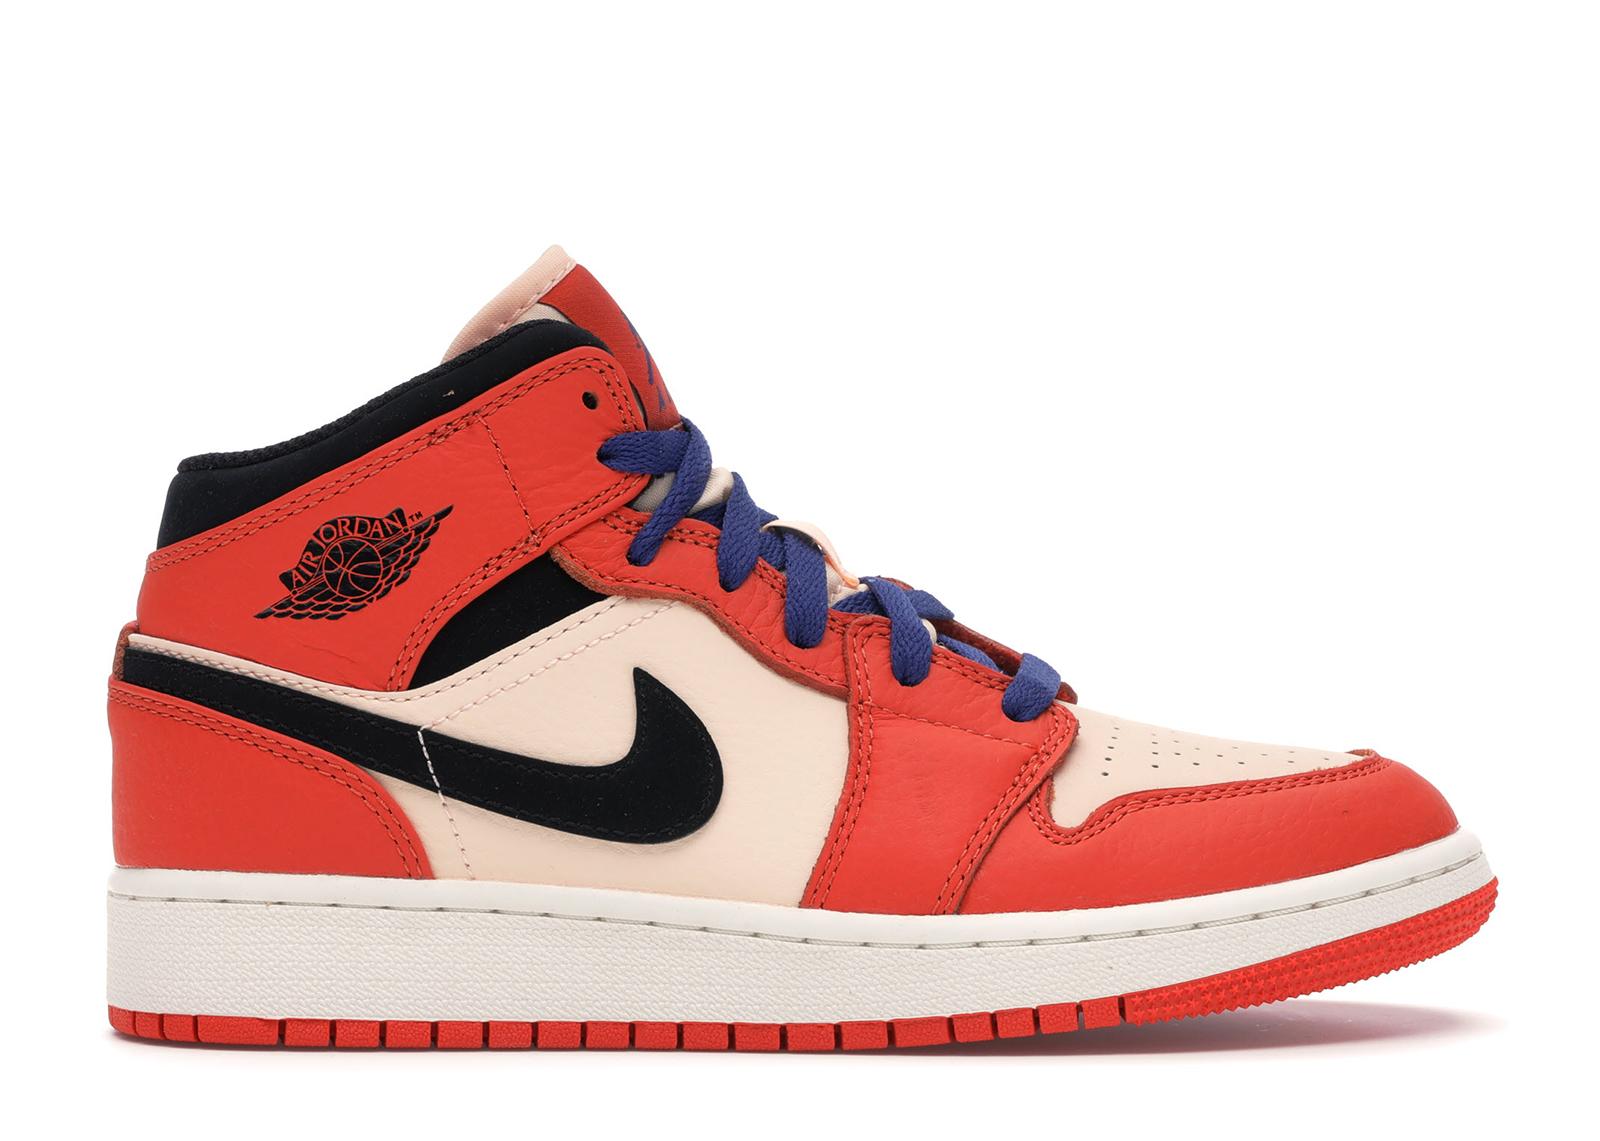 Nike Air Jordan 1 MID SE Team Orange Black Crimson Tint GS BQ6931 800 Size 4Y-7Y